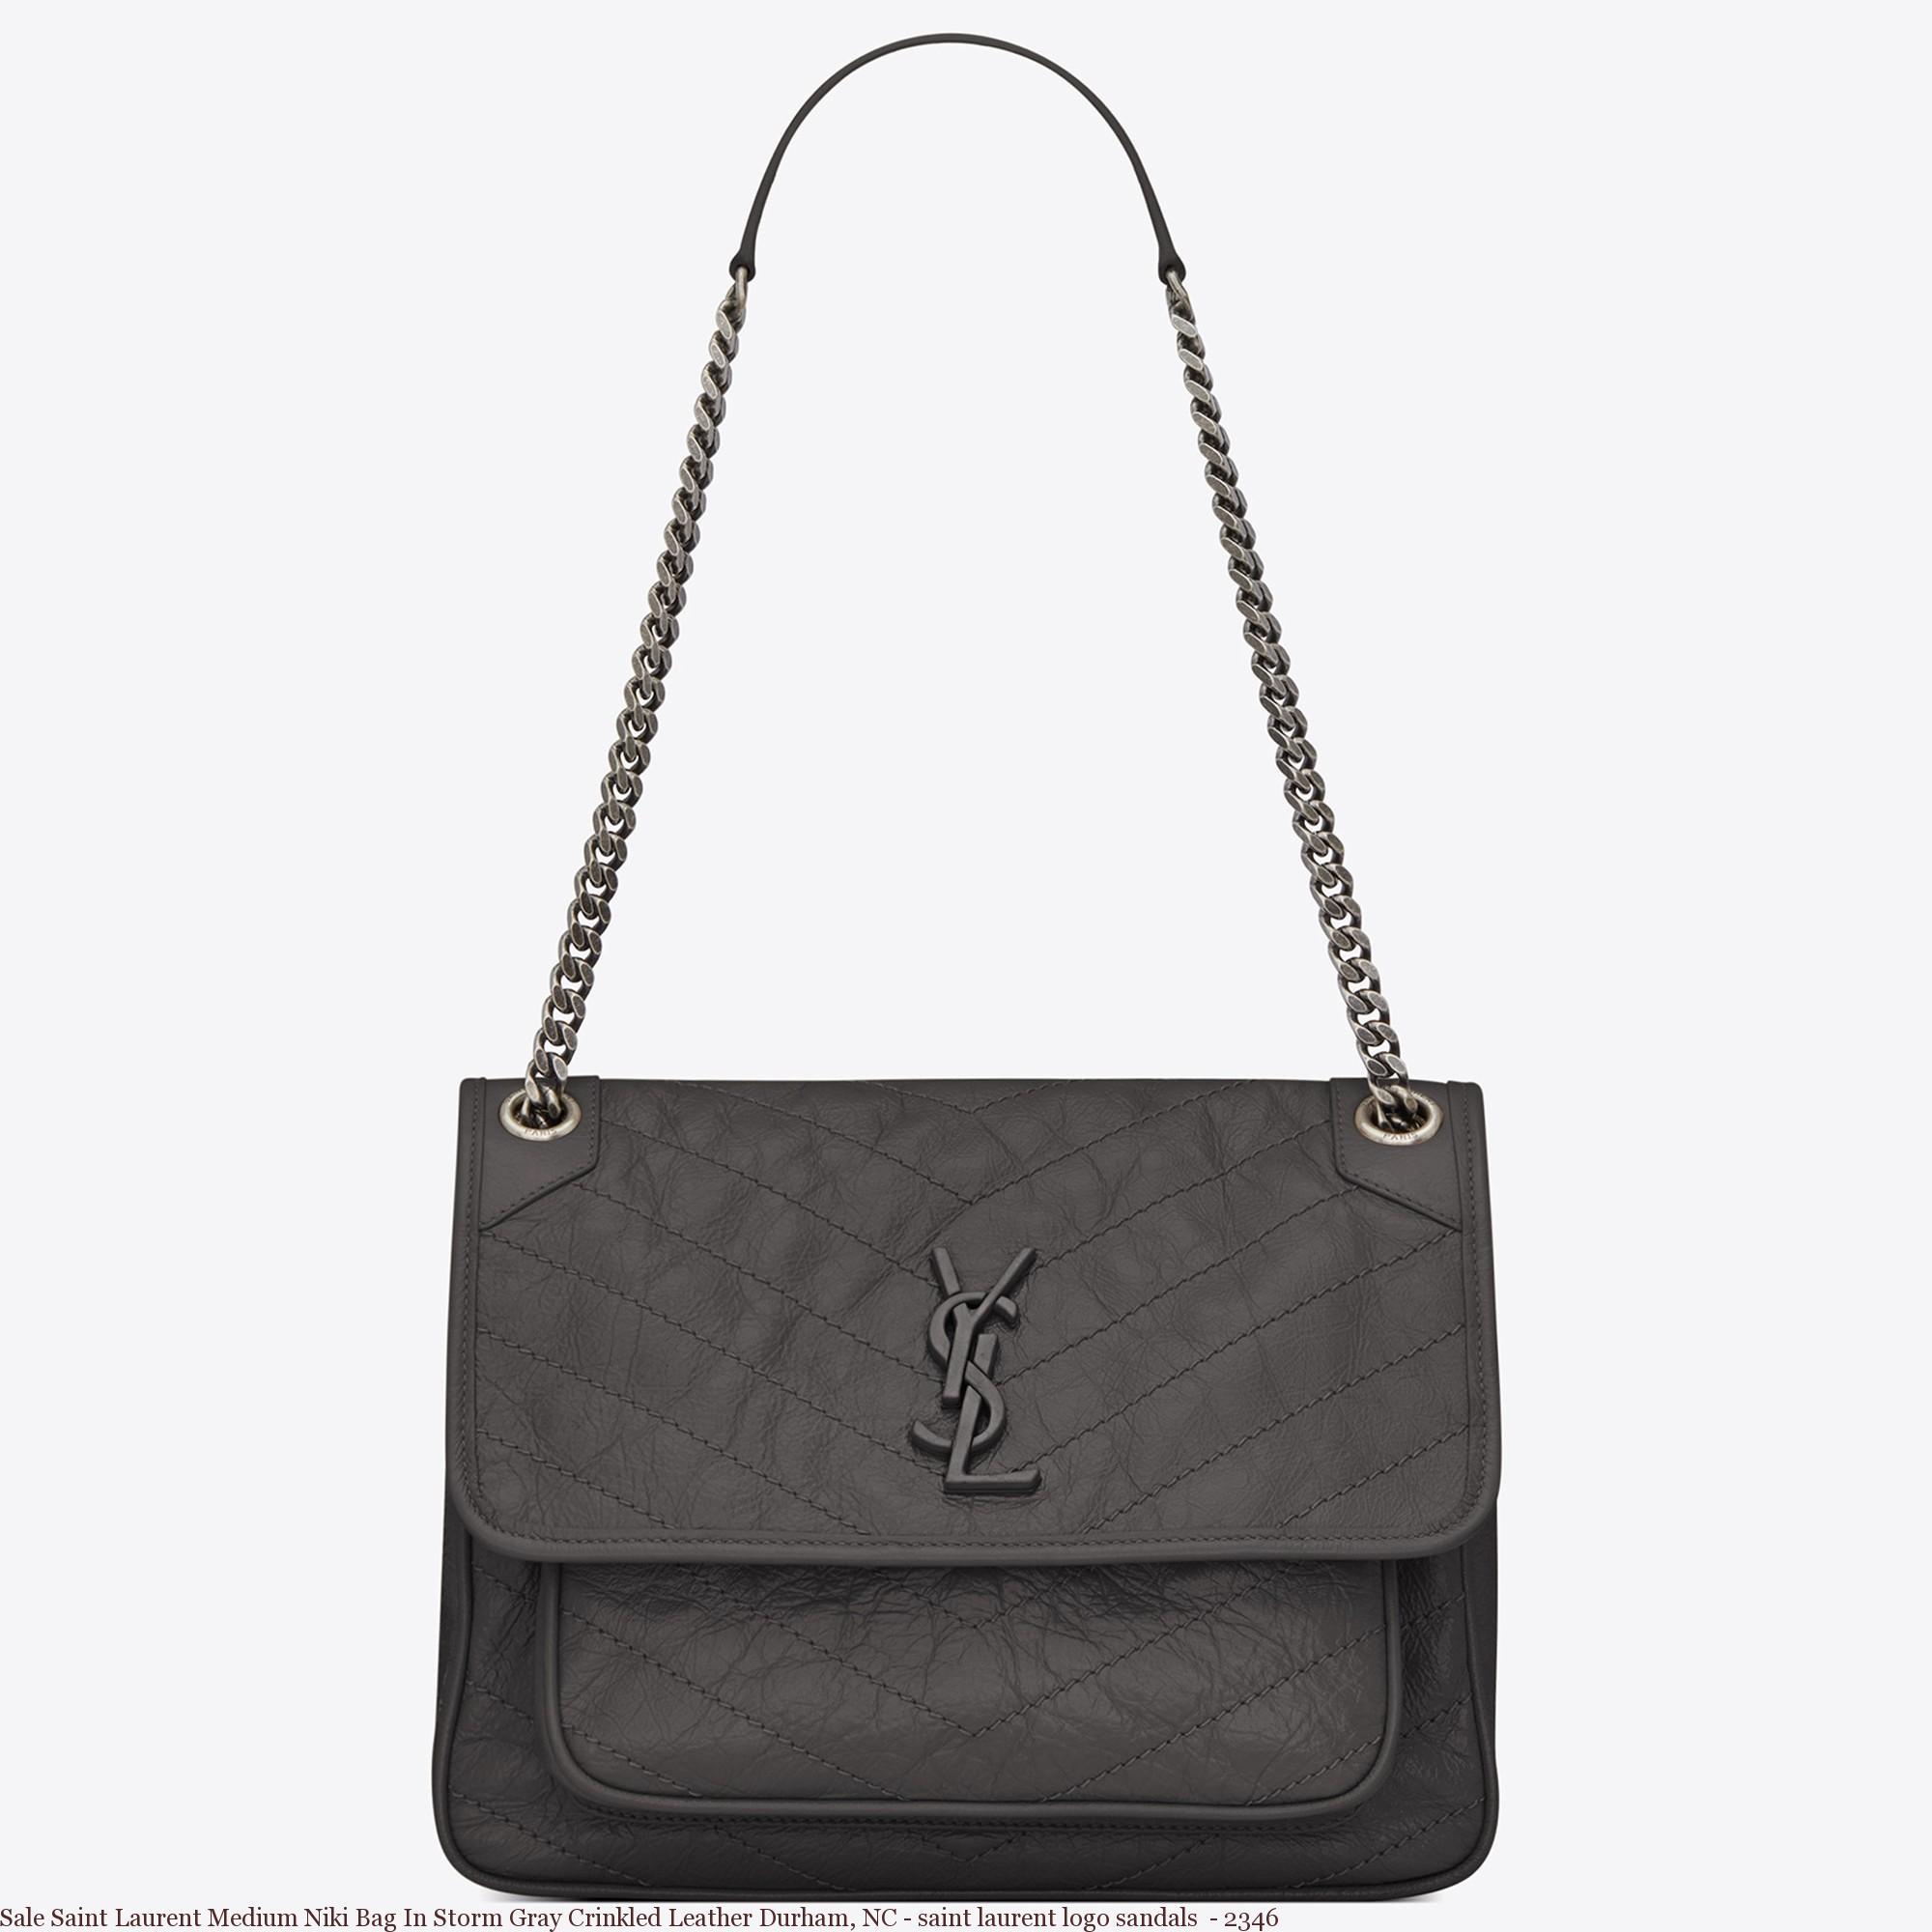 Sale Saint Laurent Medium Niki Bag In Storm Gray Crinkled